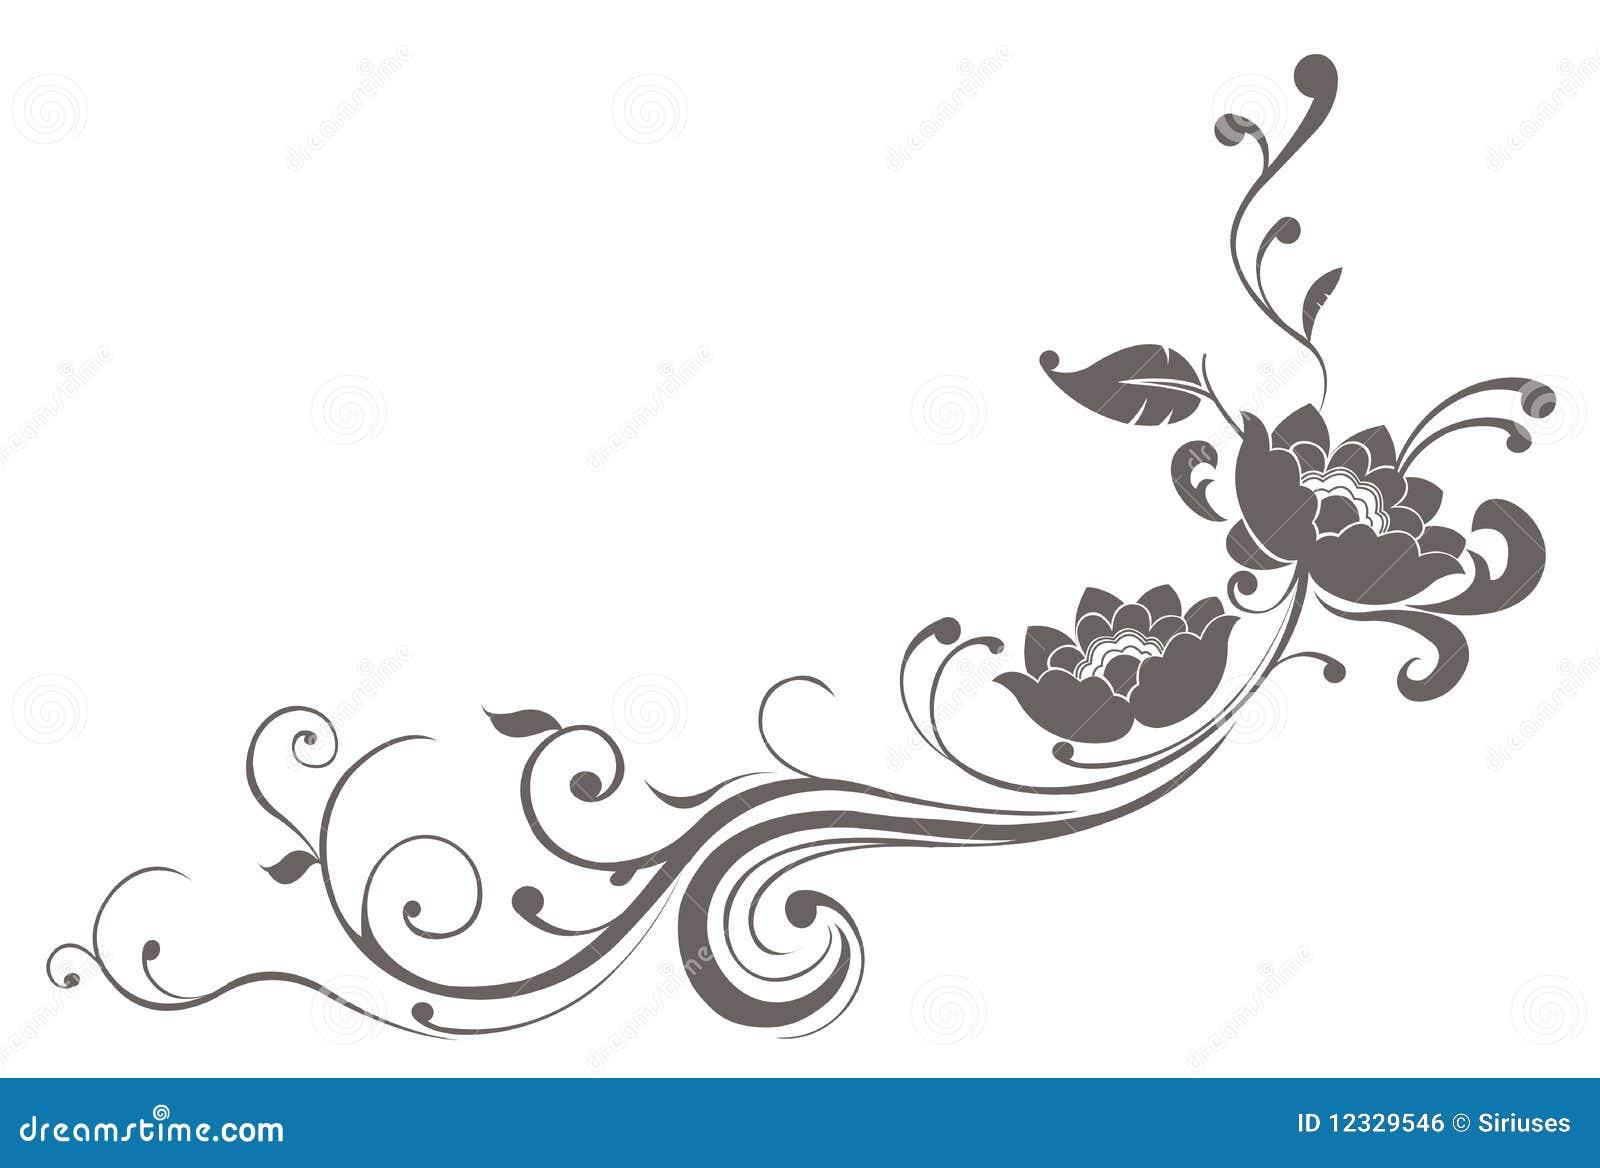 Lotus flower pattern stock illustration illustration of botanical lotus flower pattern izmirmasajfo